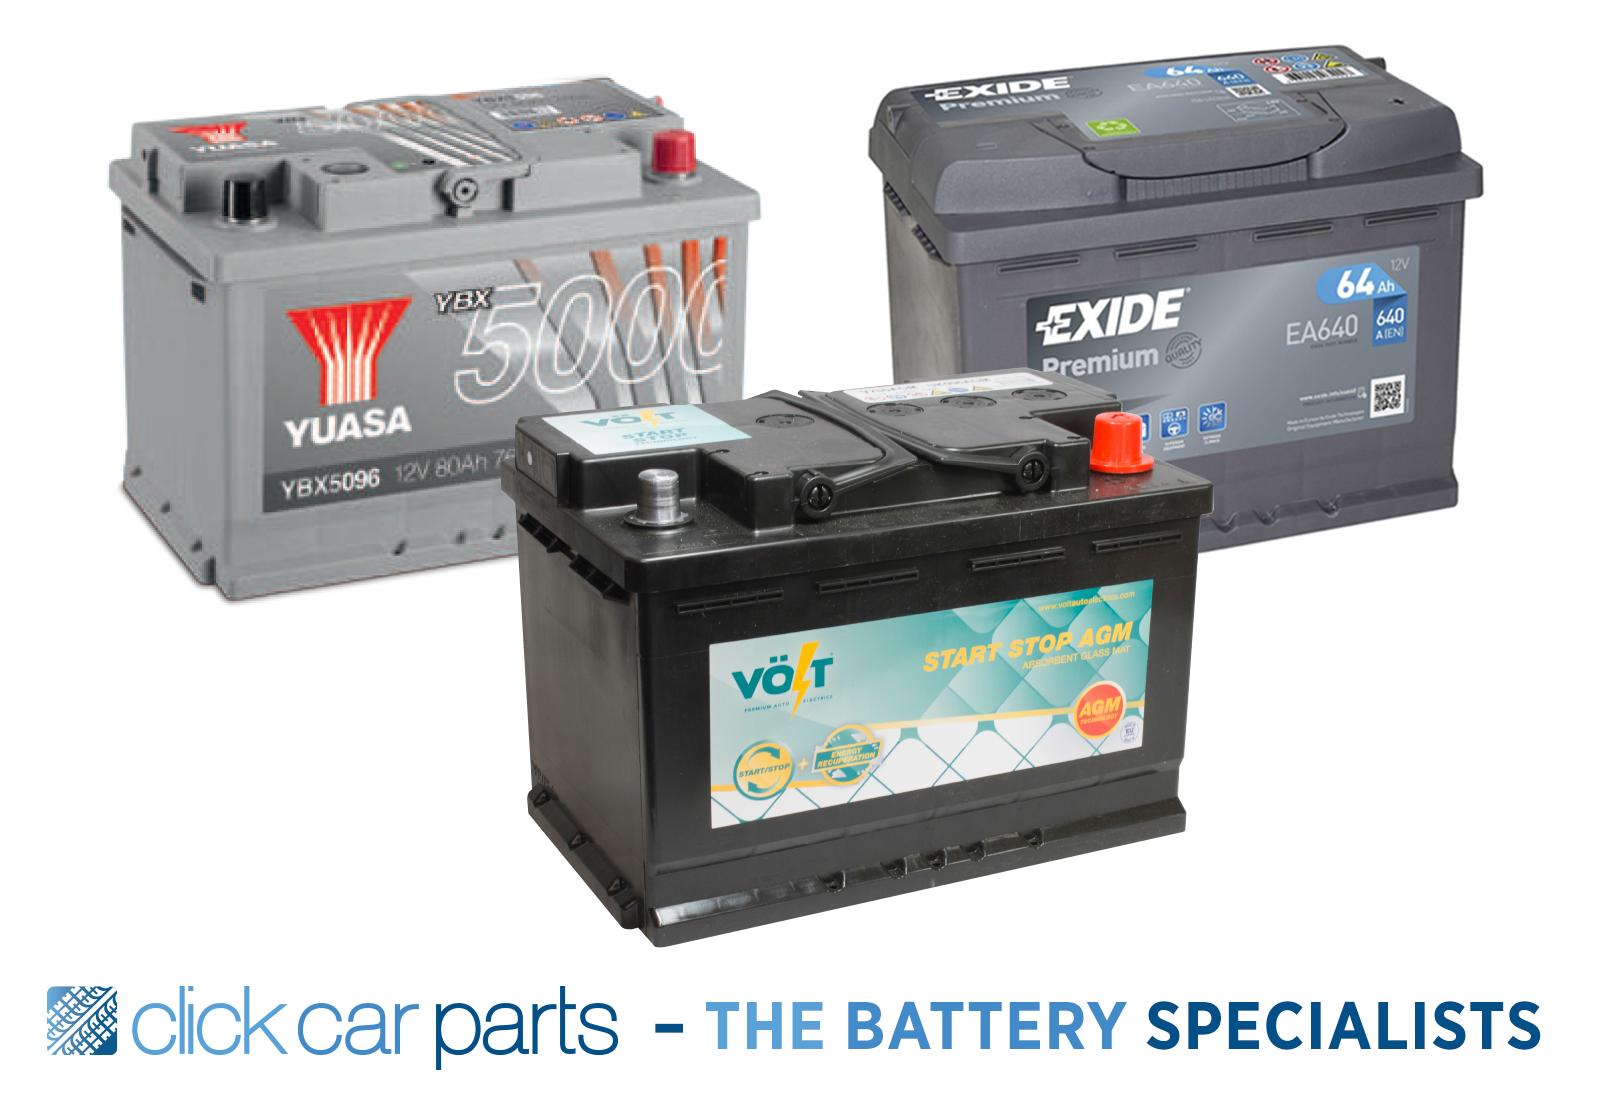 EA530 YBX5012 PREMIUM 12v Type 079 Car Battery